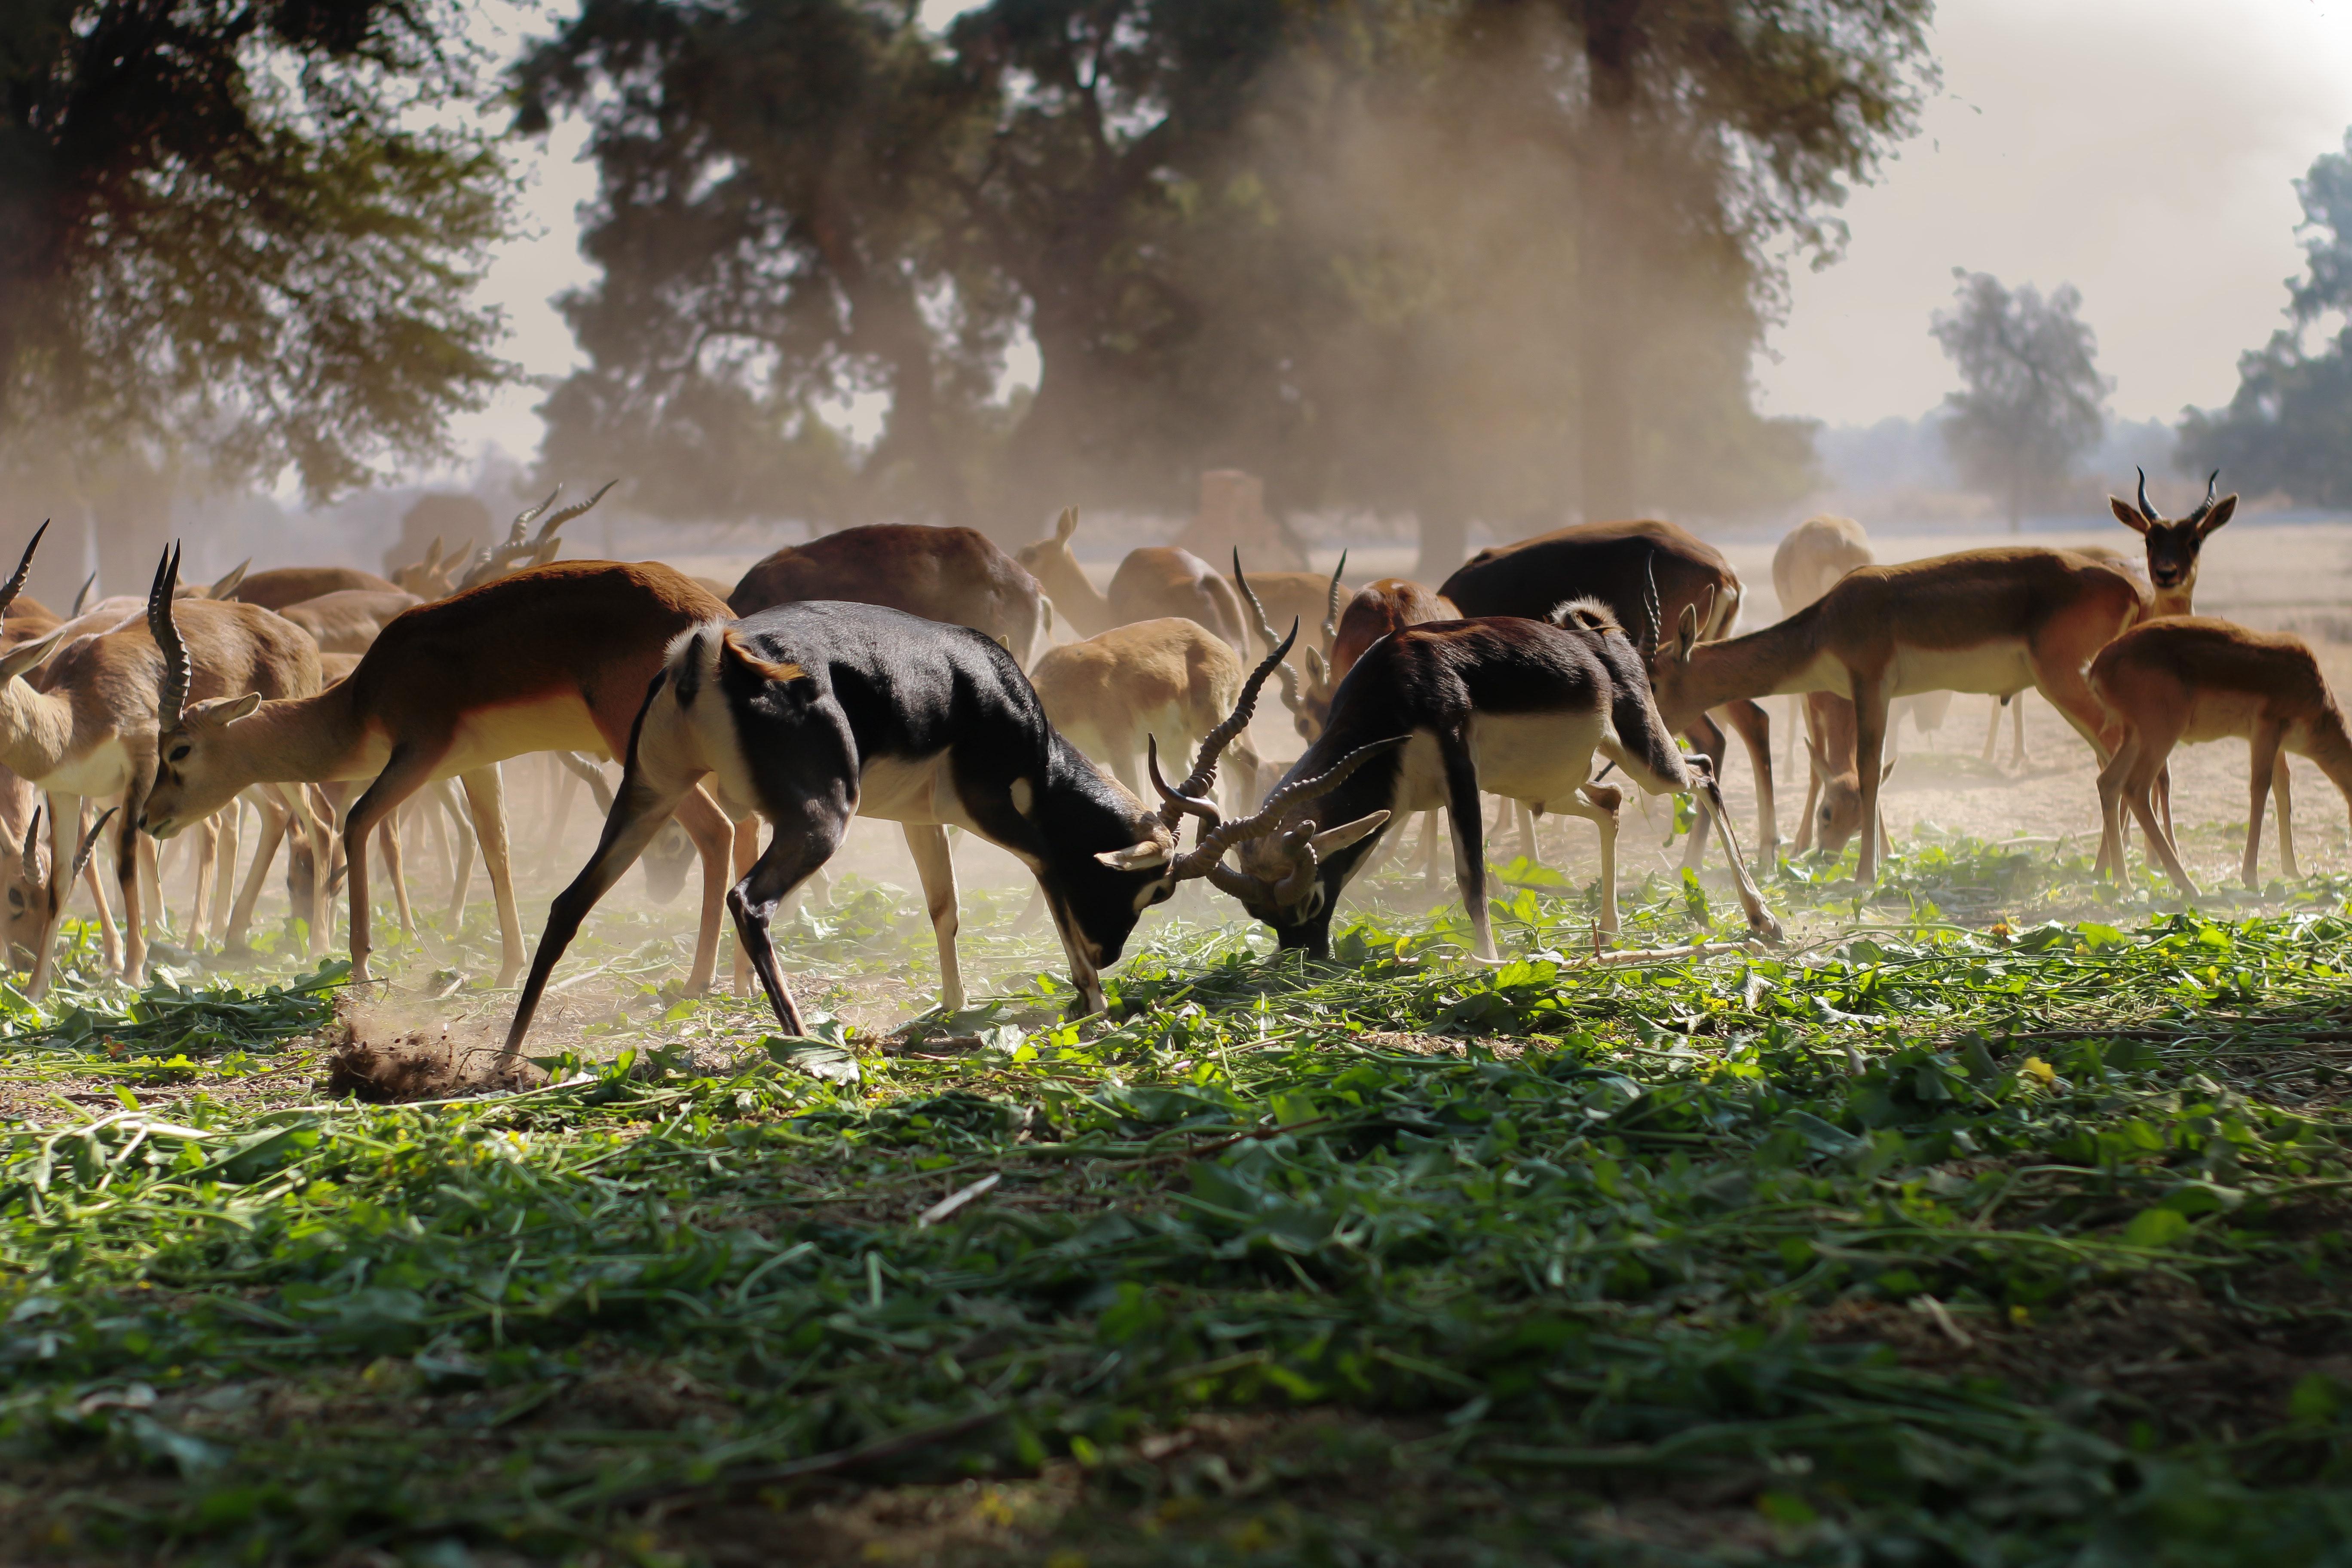 Flock of Brown Deer on Green Grass Field, Nature, Mammal, Impala, Horns, HQ Photo